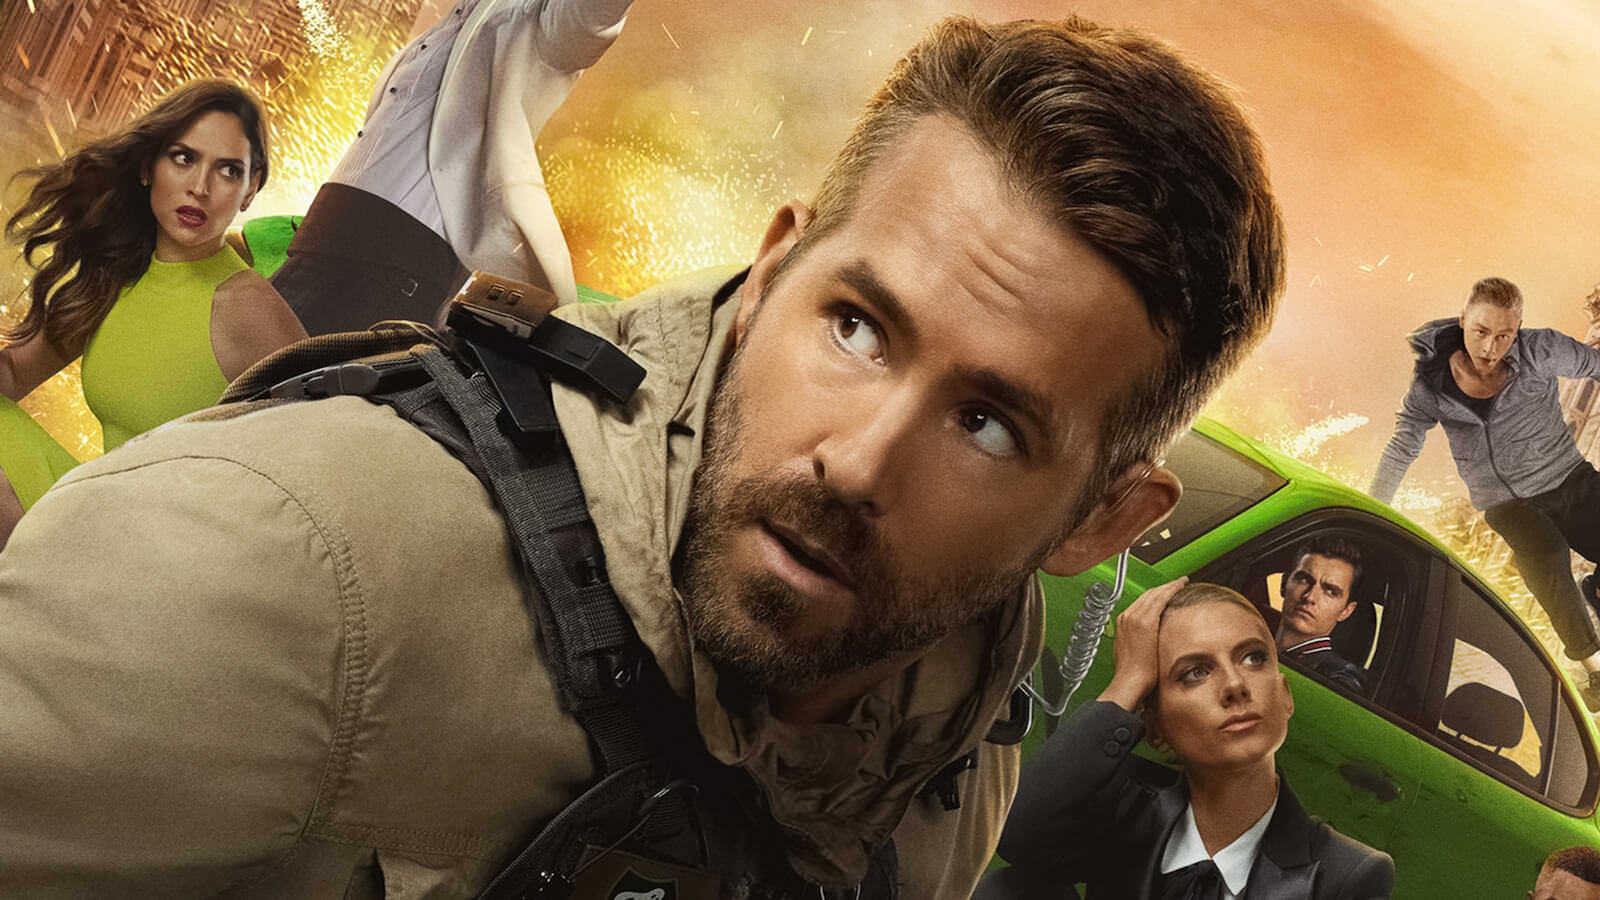 【Netflix推荐】原创电影观看次数排行榜TOP 10-MP4吧